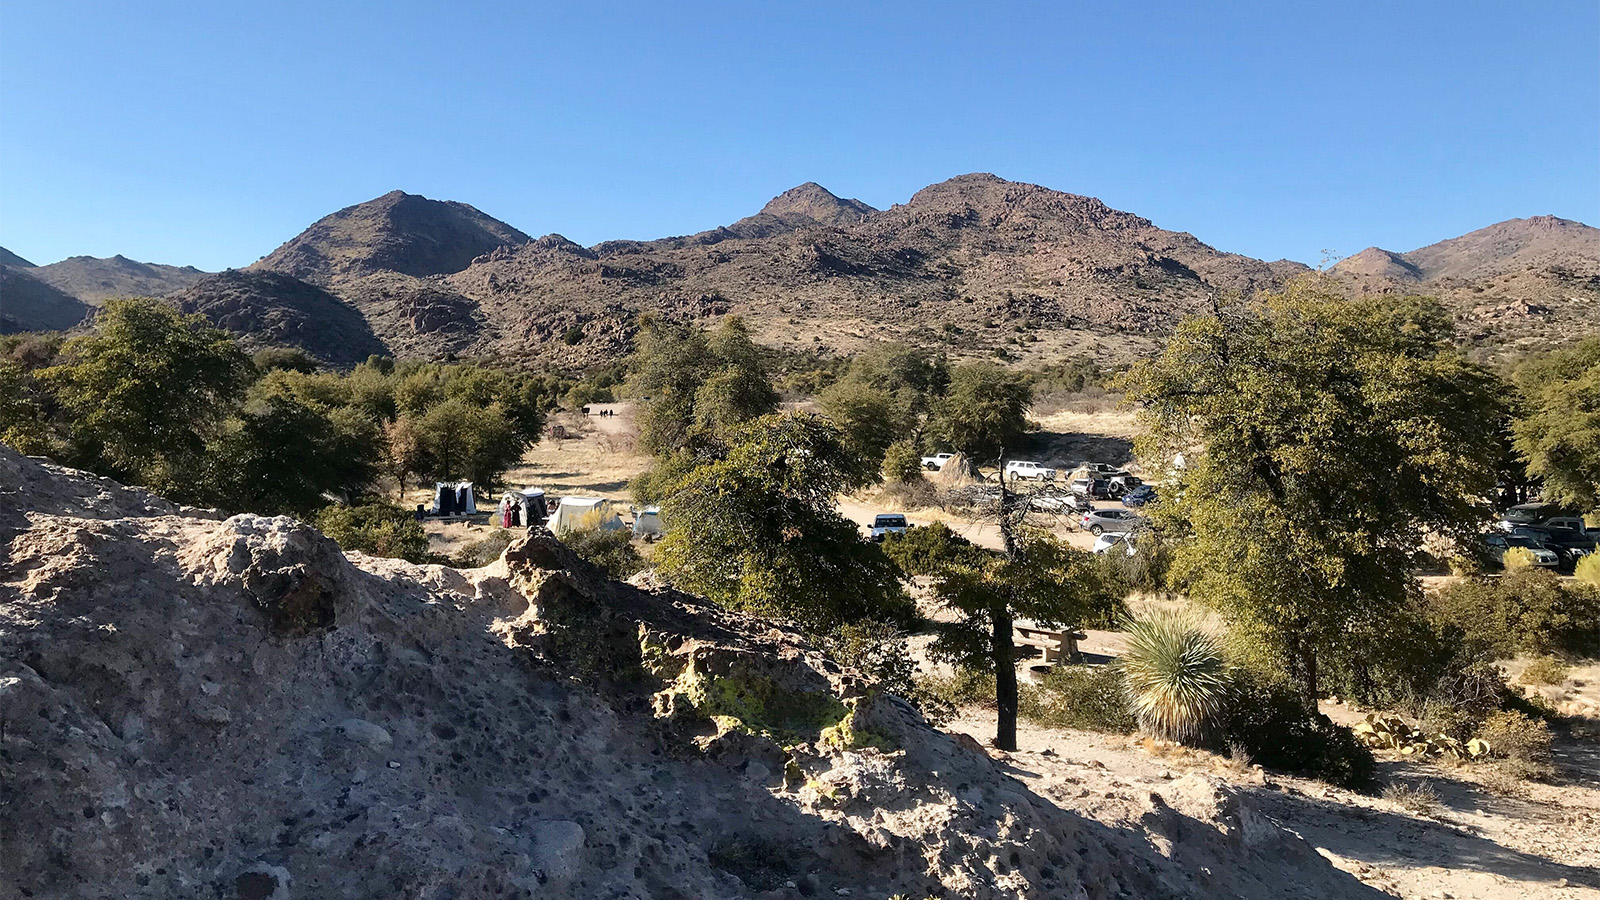 An overview of the Oak Flat campground, Saturday, Feb. 27, 2021, near Superior, Arizona. RNS photo by Alejandra Molina